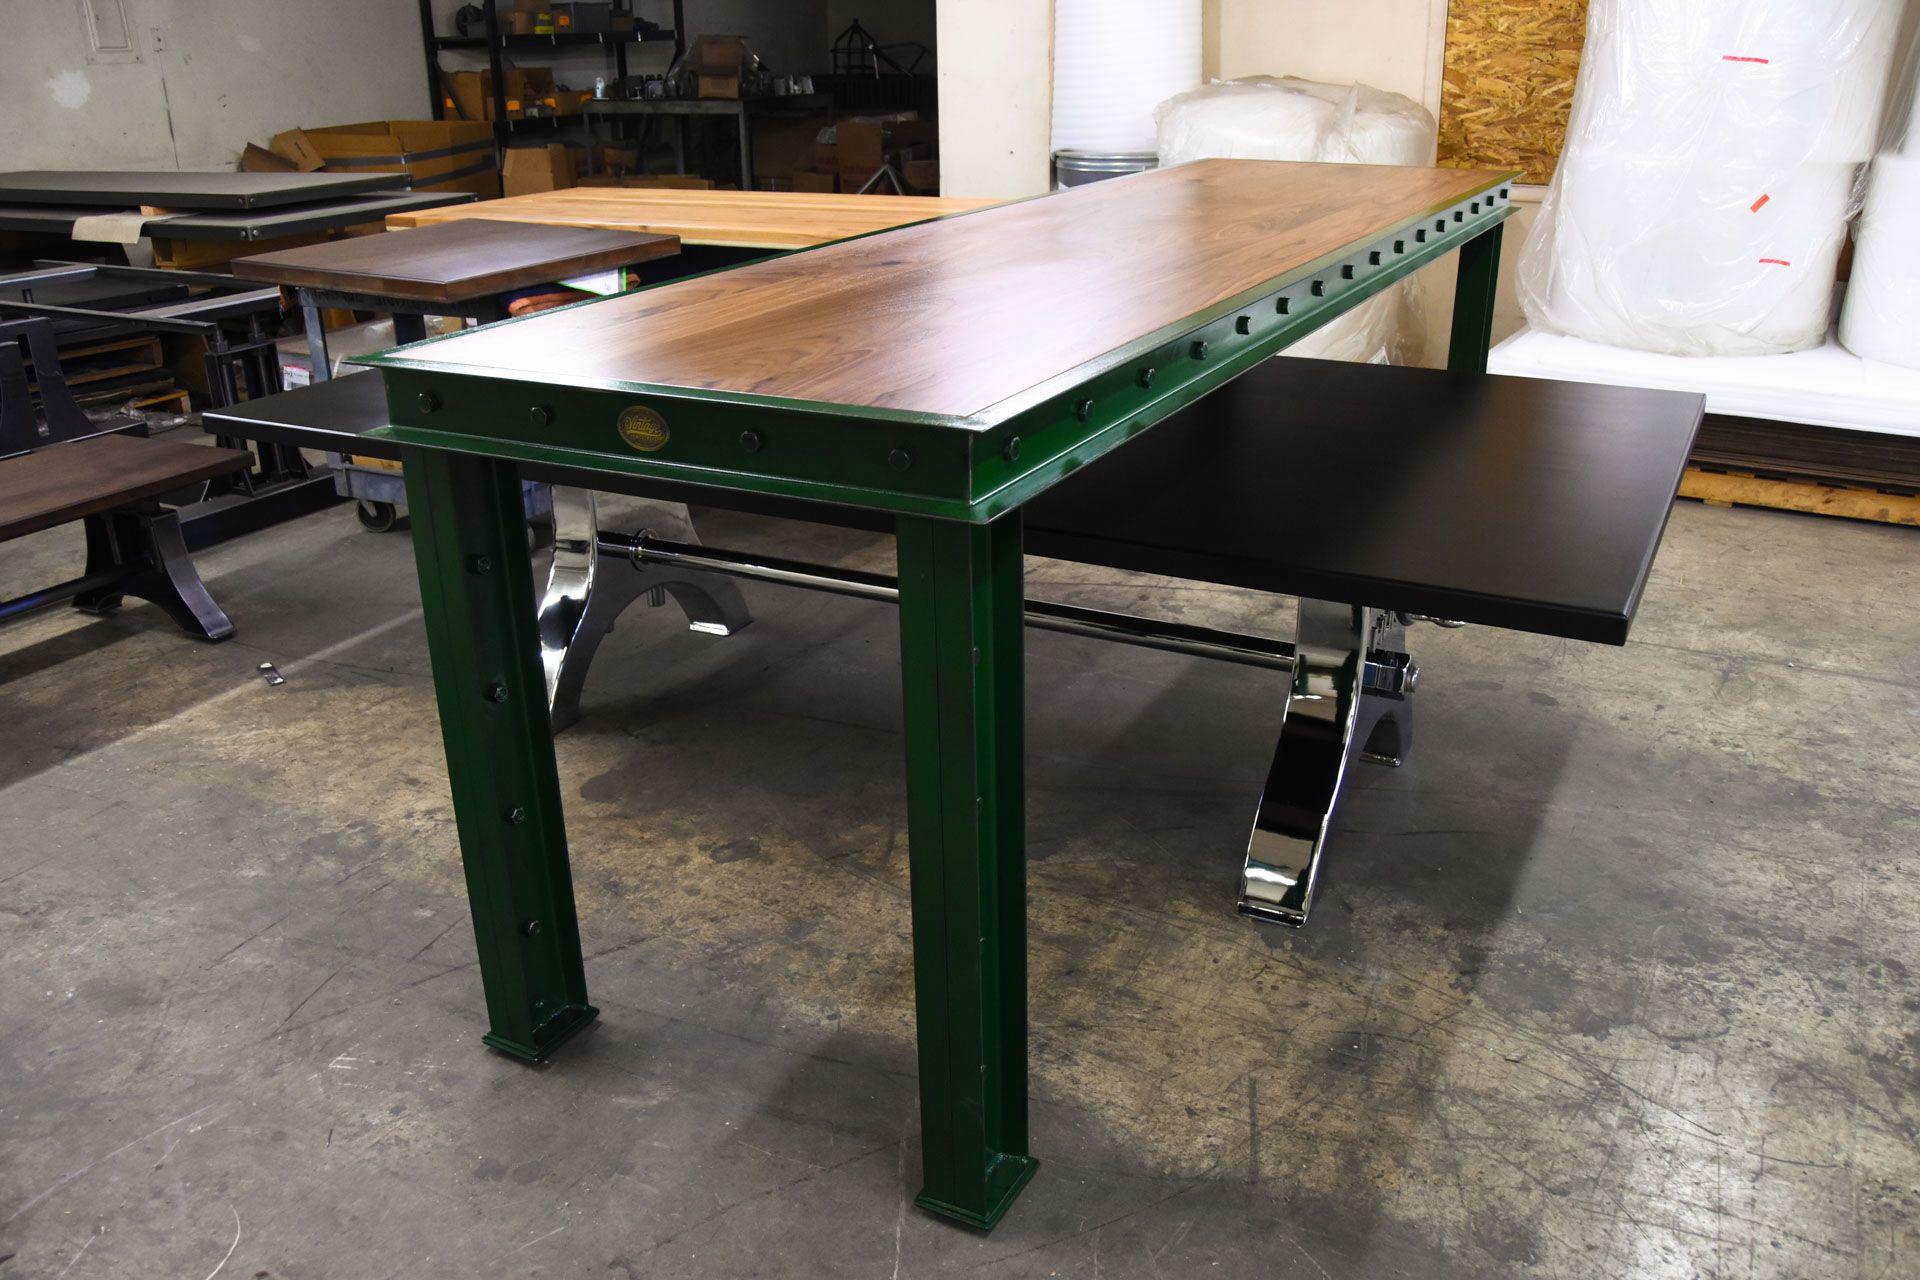 Green Firehouse Bar Tables U2013 Model #FH11 U2013 Vintage Industrial Furniture